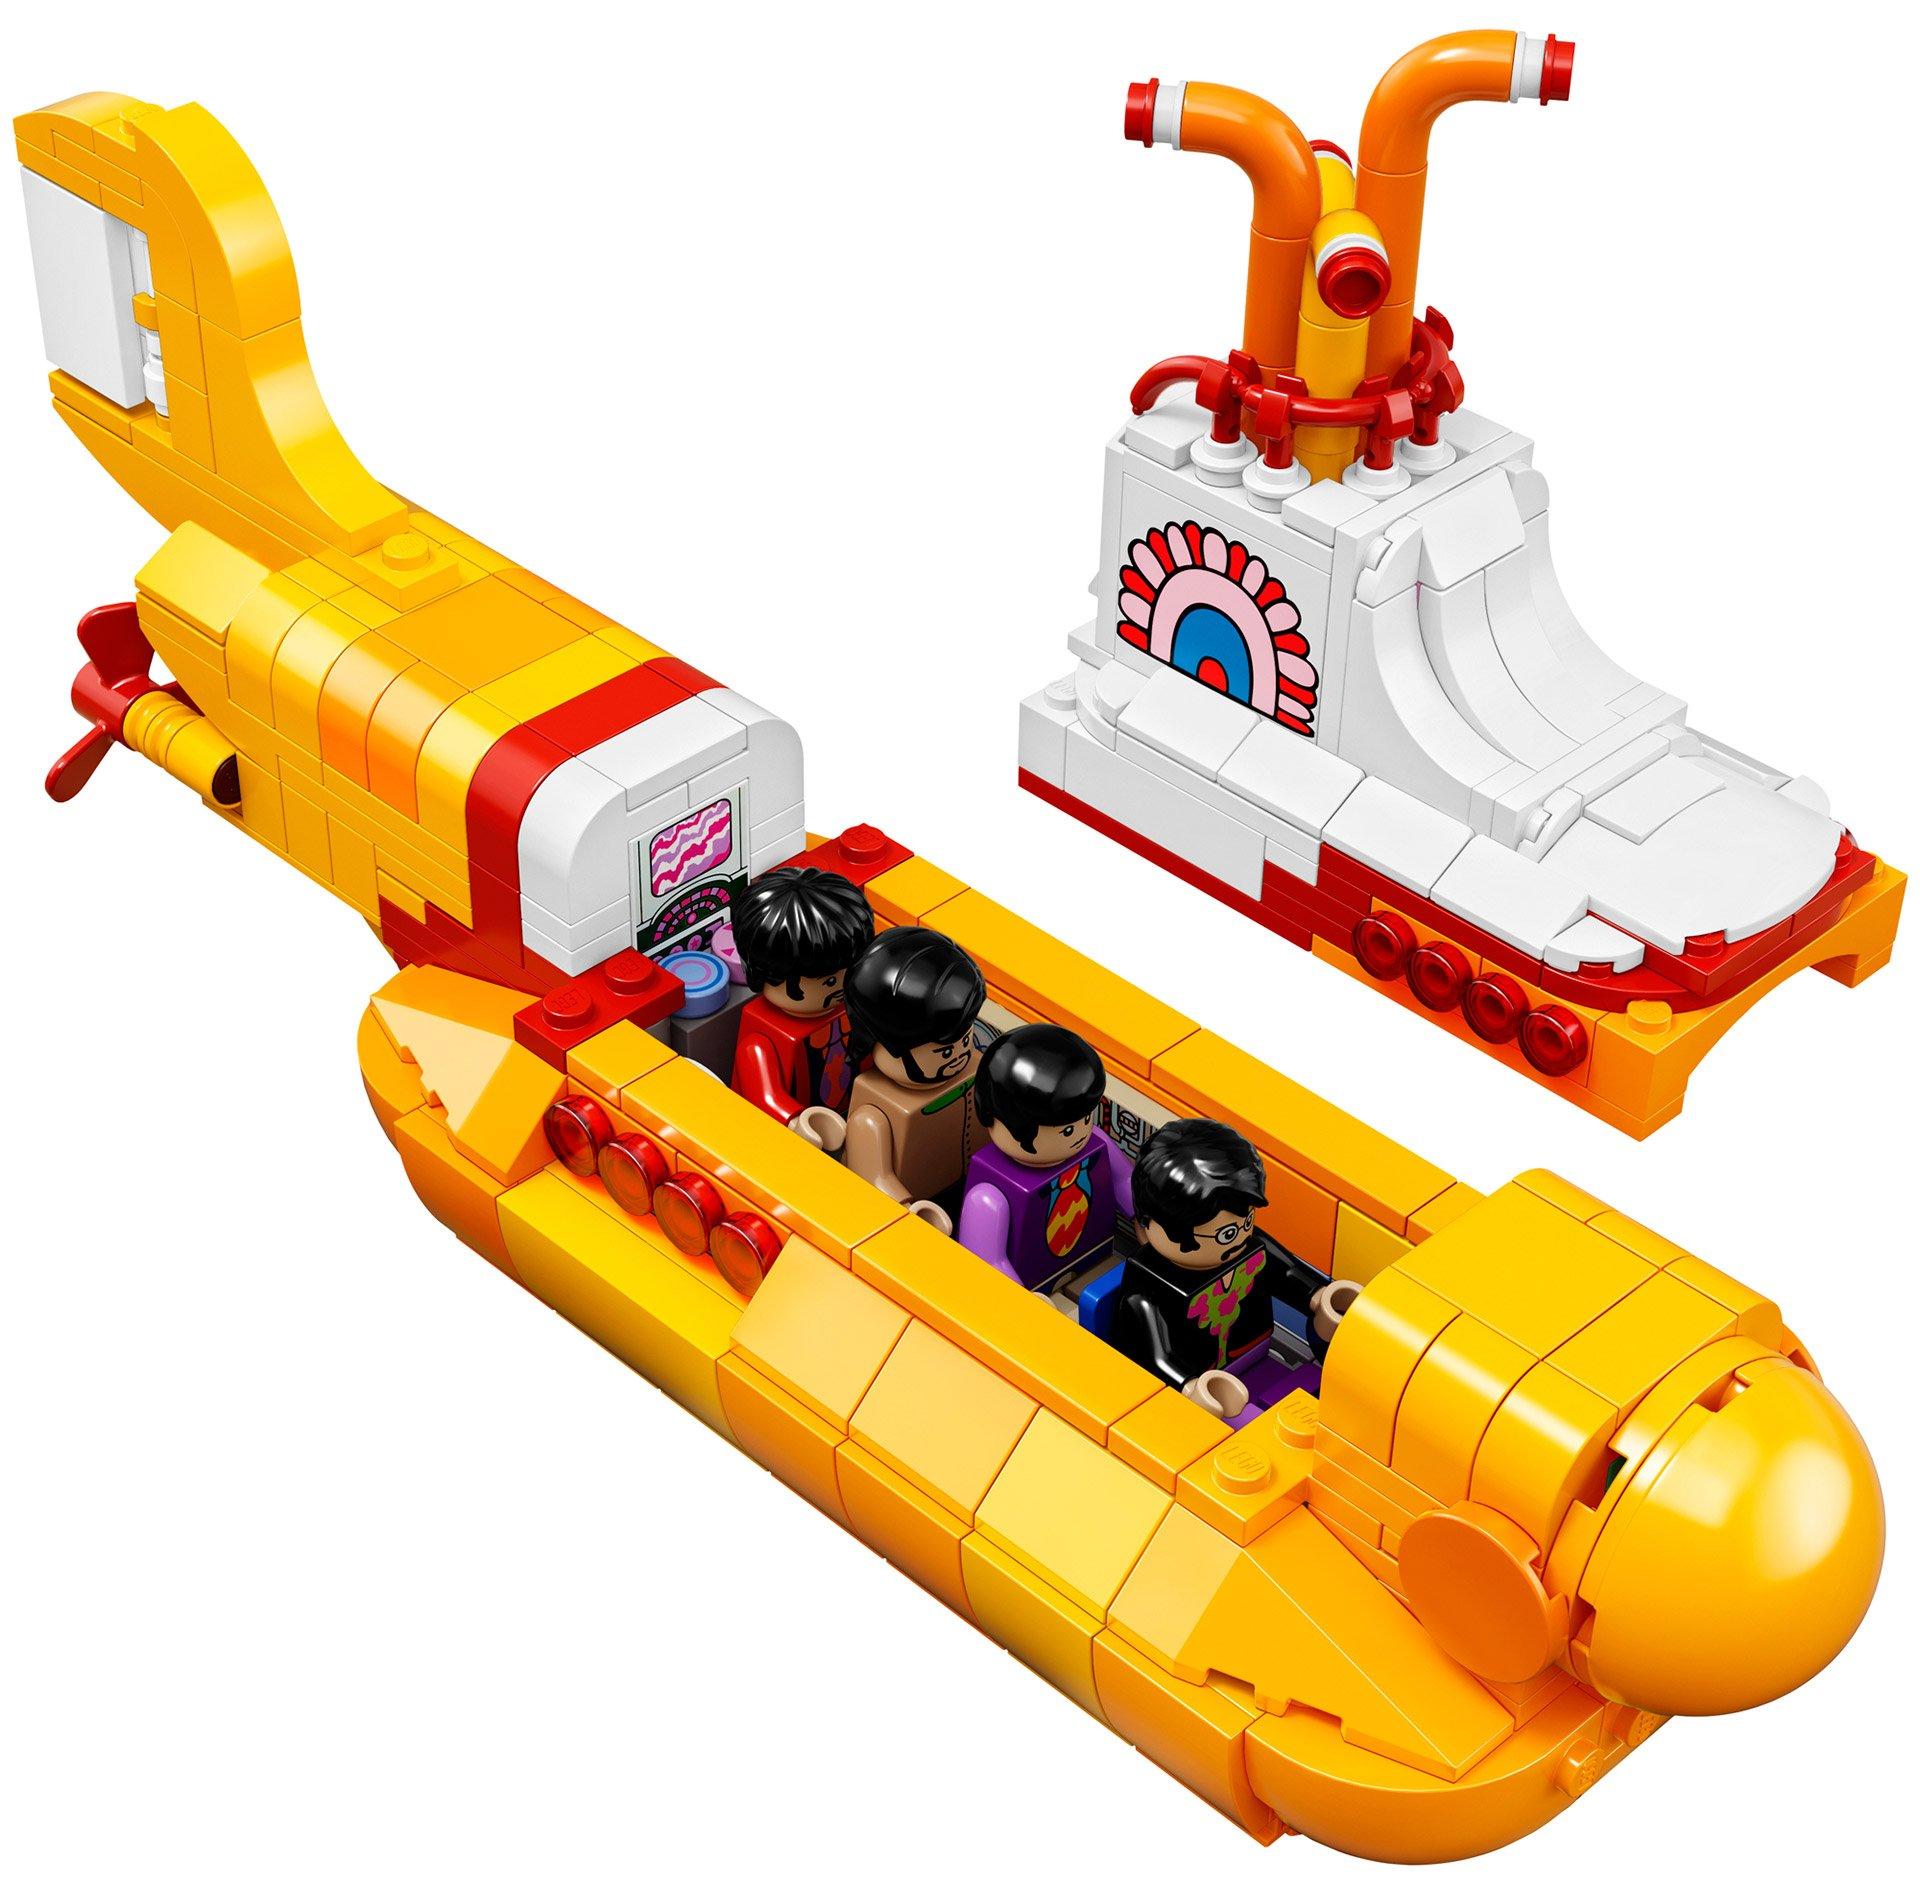 LEGO Yellow Submarine